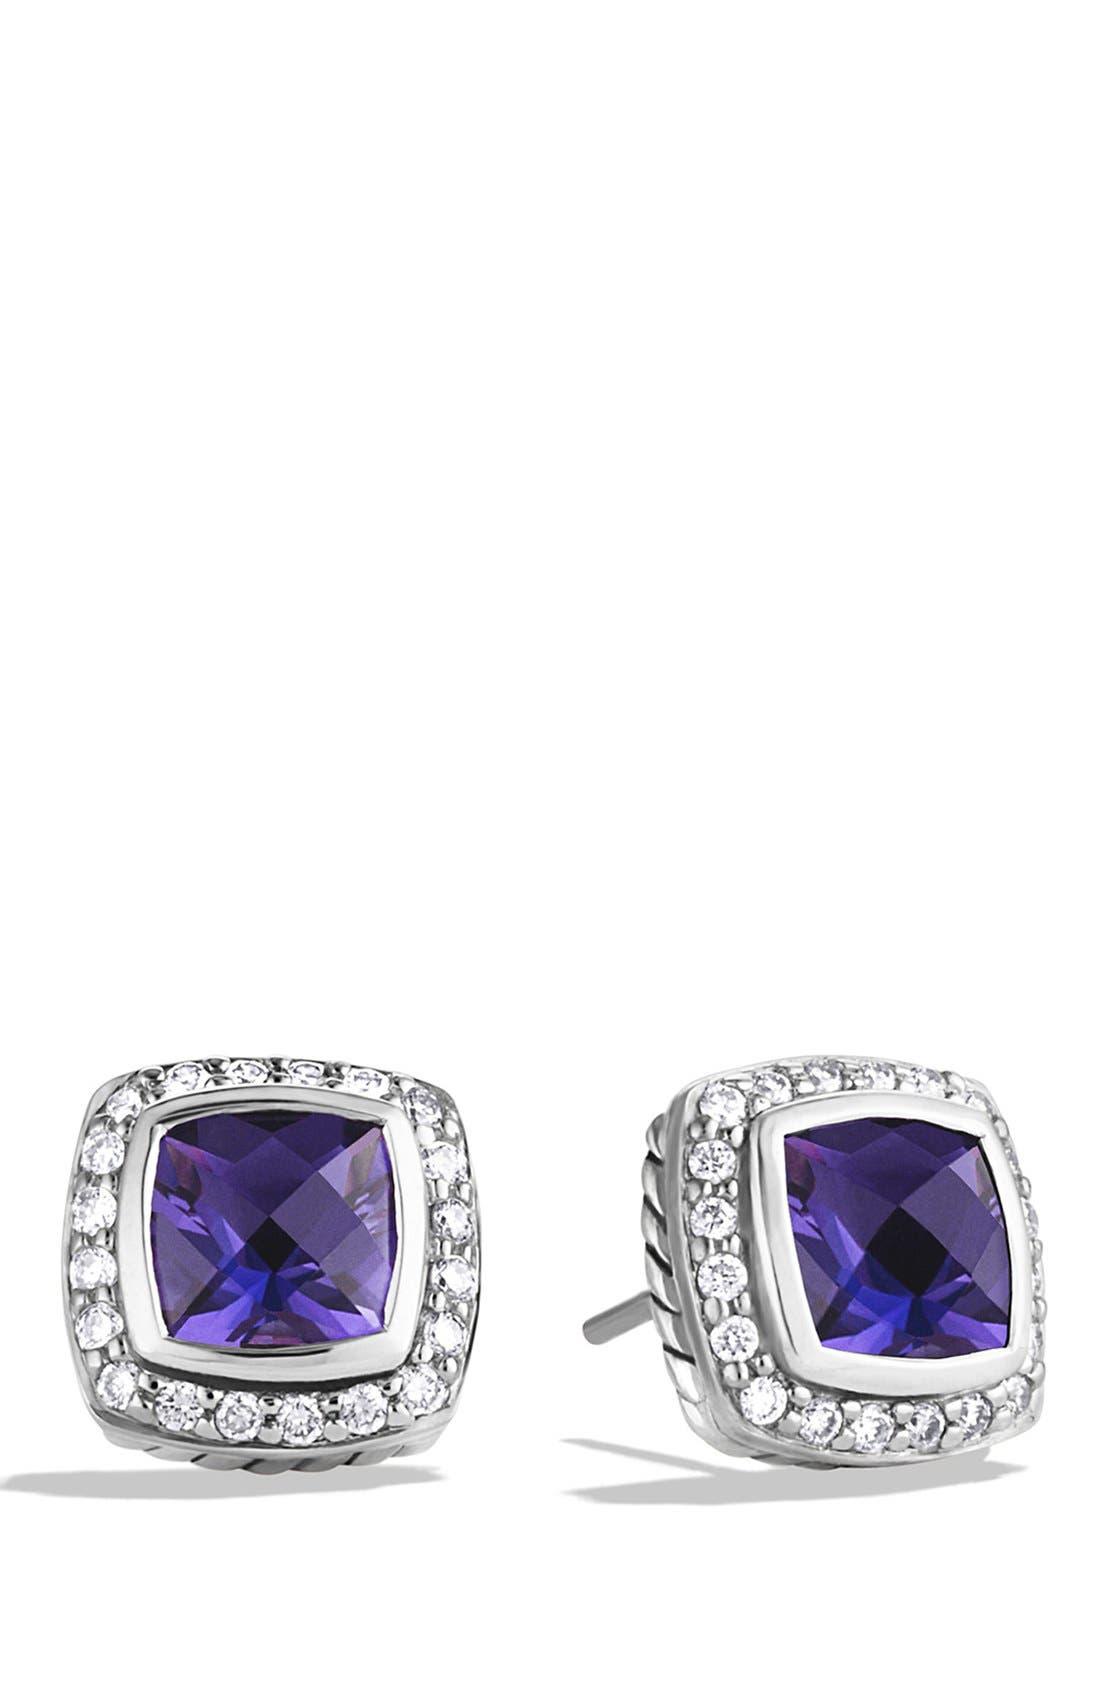 'Albion' Petite Earrings with Semiprecious Stones & Diamonds,                             Main thumbnail 5, color,